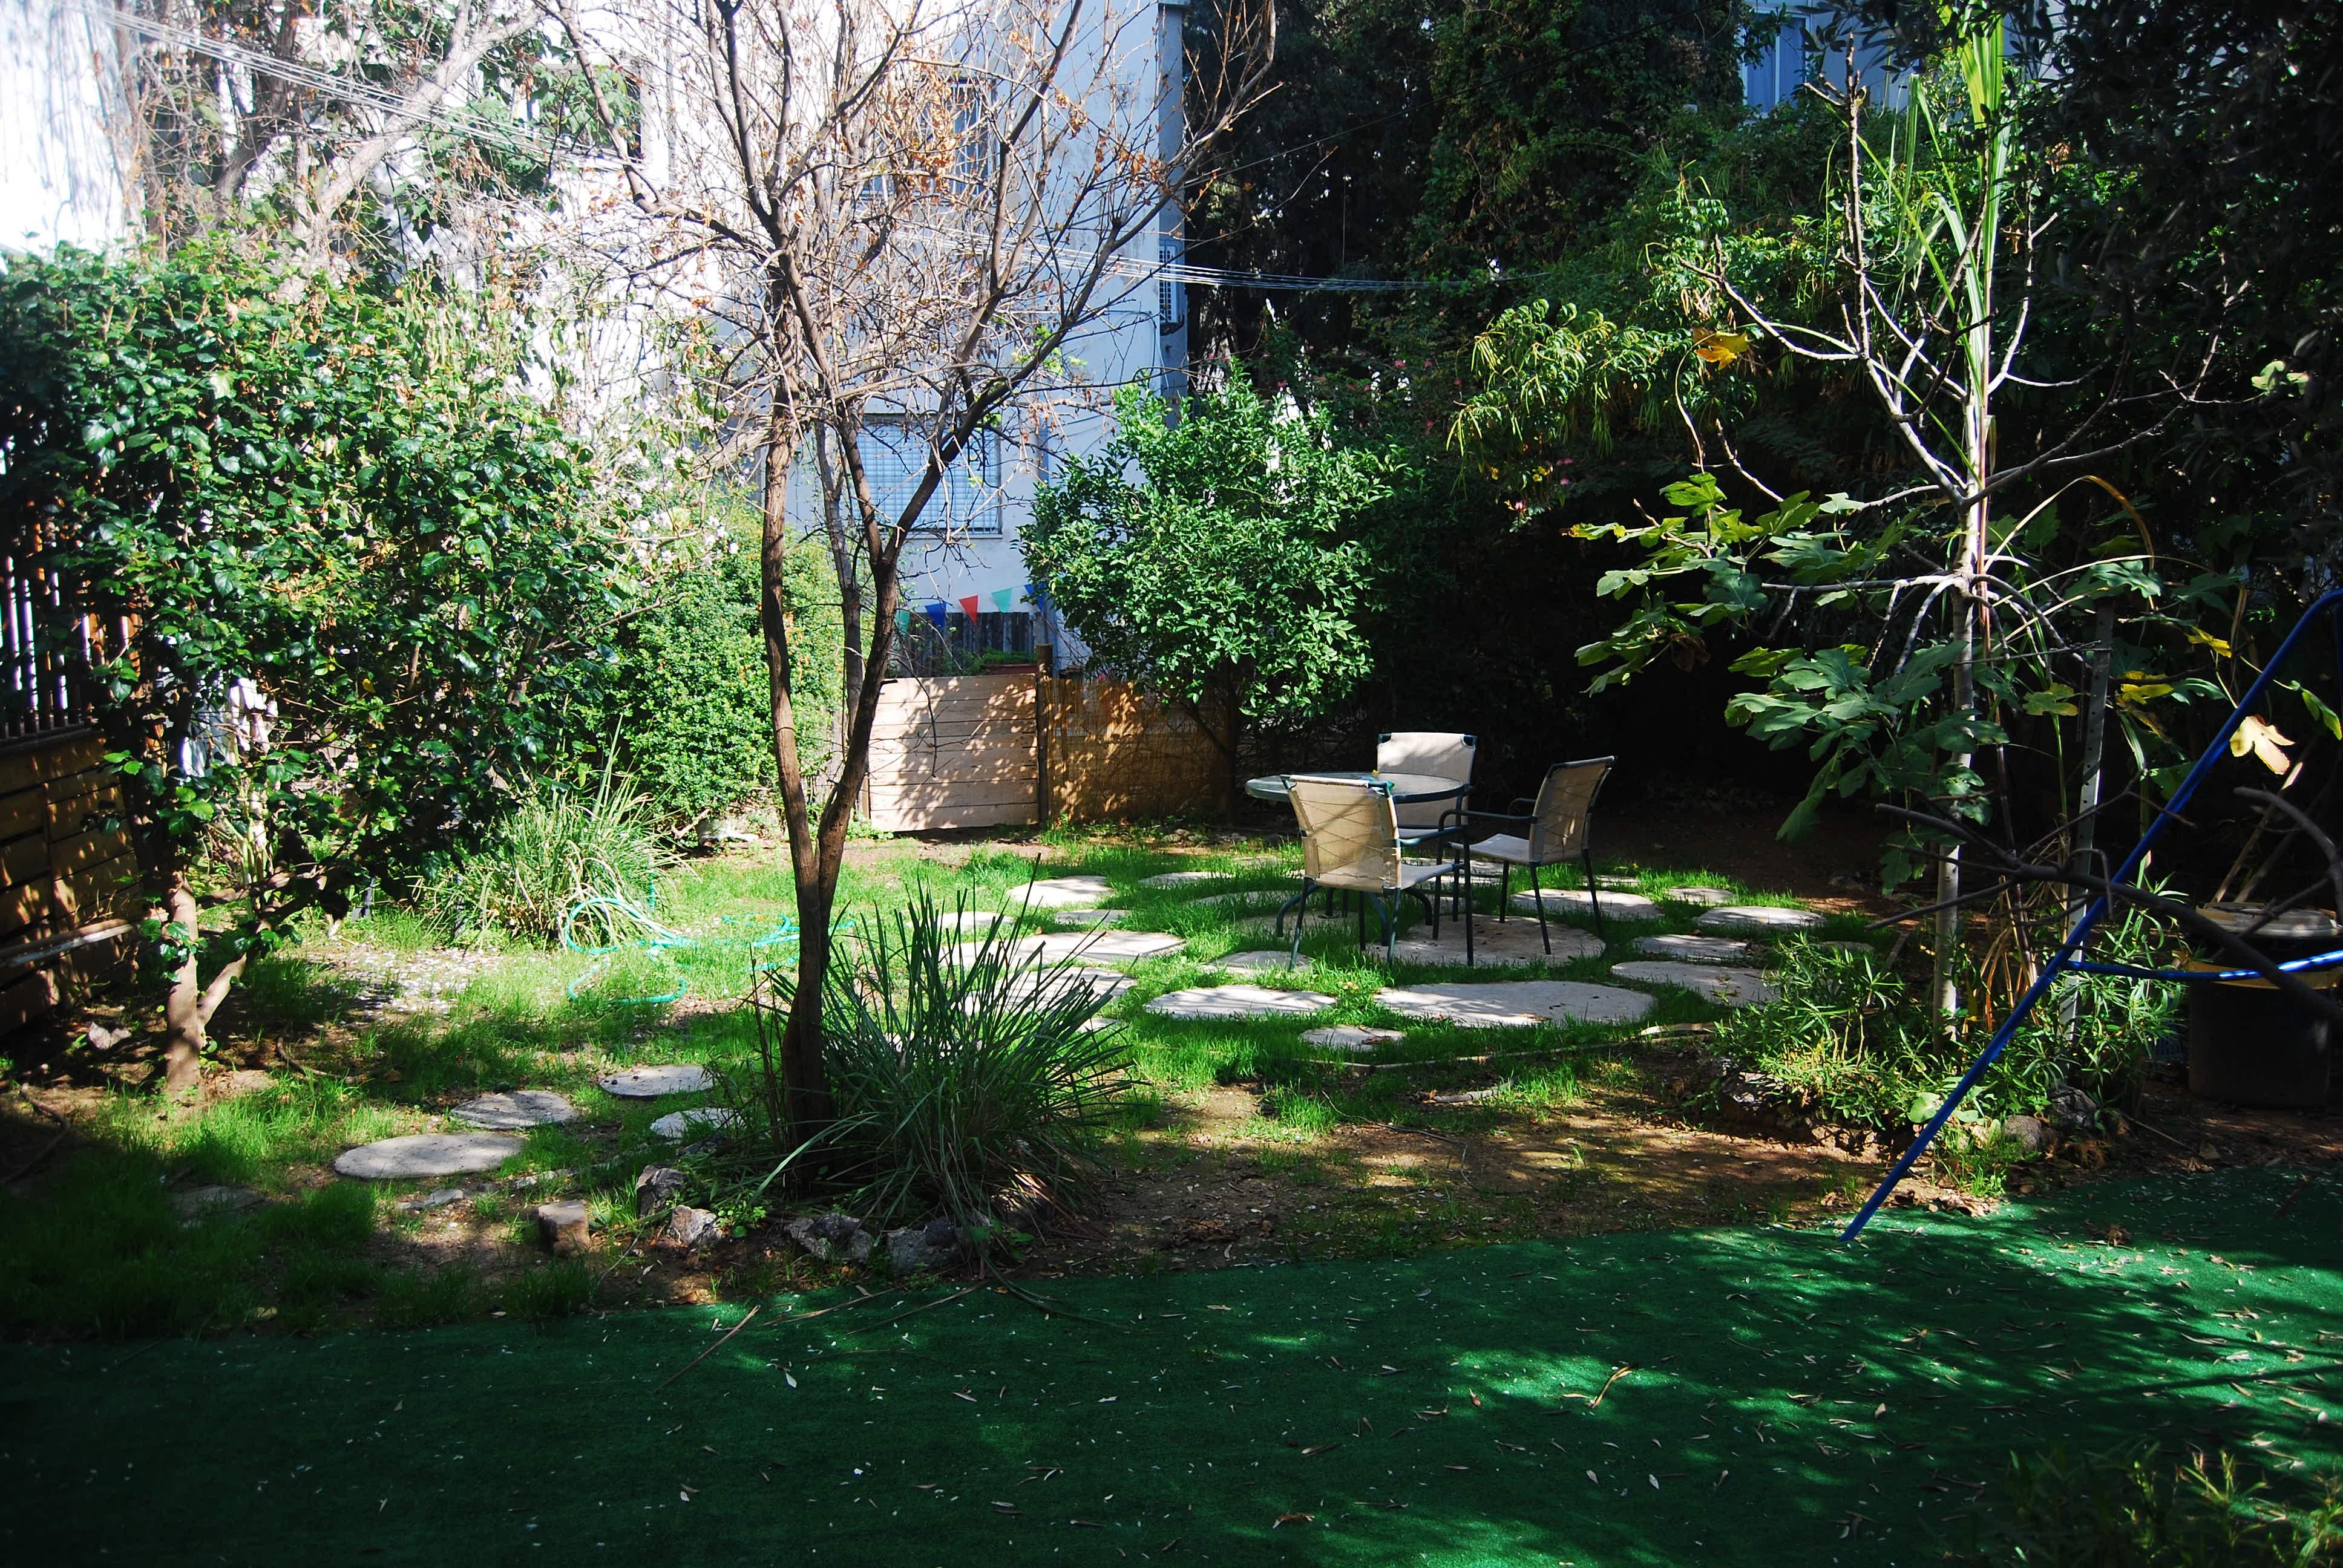 Charming Garden Apartment for Rent on Rothschild Boulevard